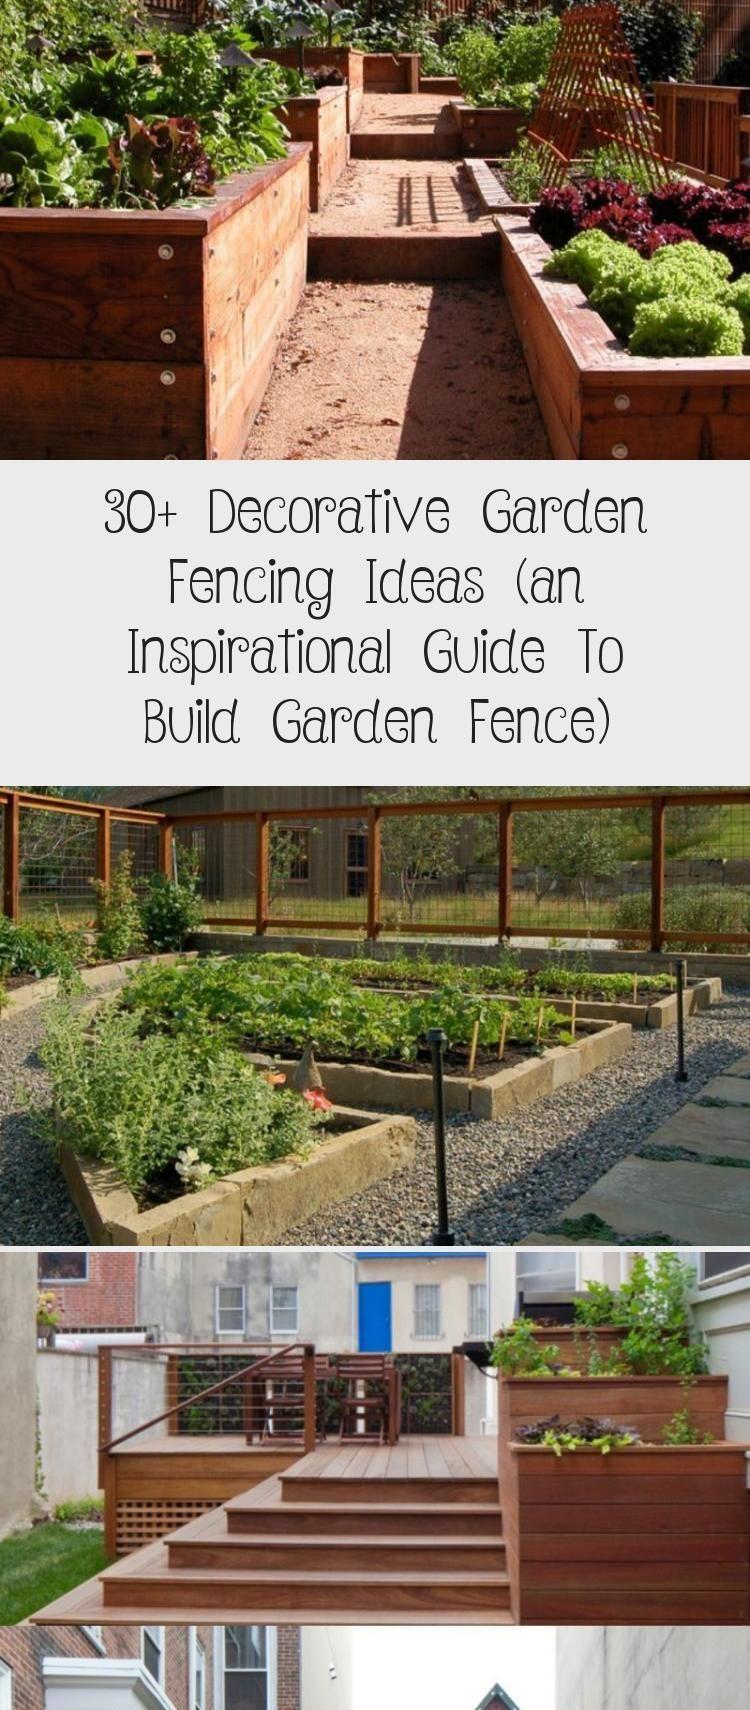 30 Decorative Garden Fencing Ideas An Inspirational Guide To